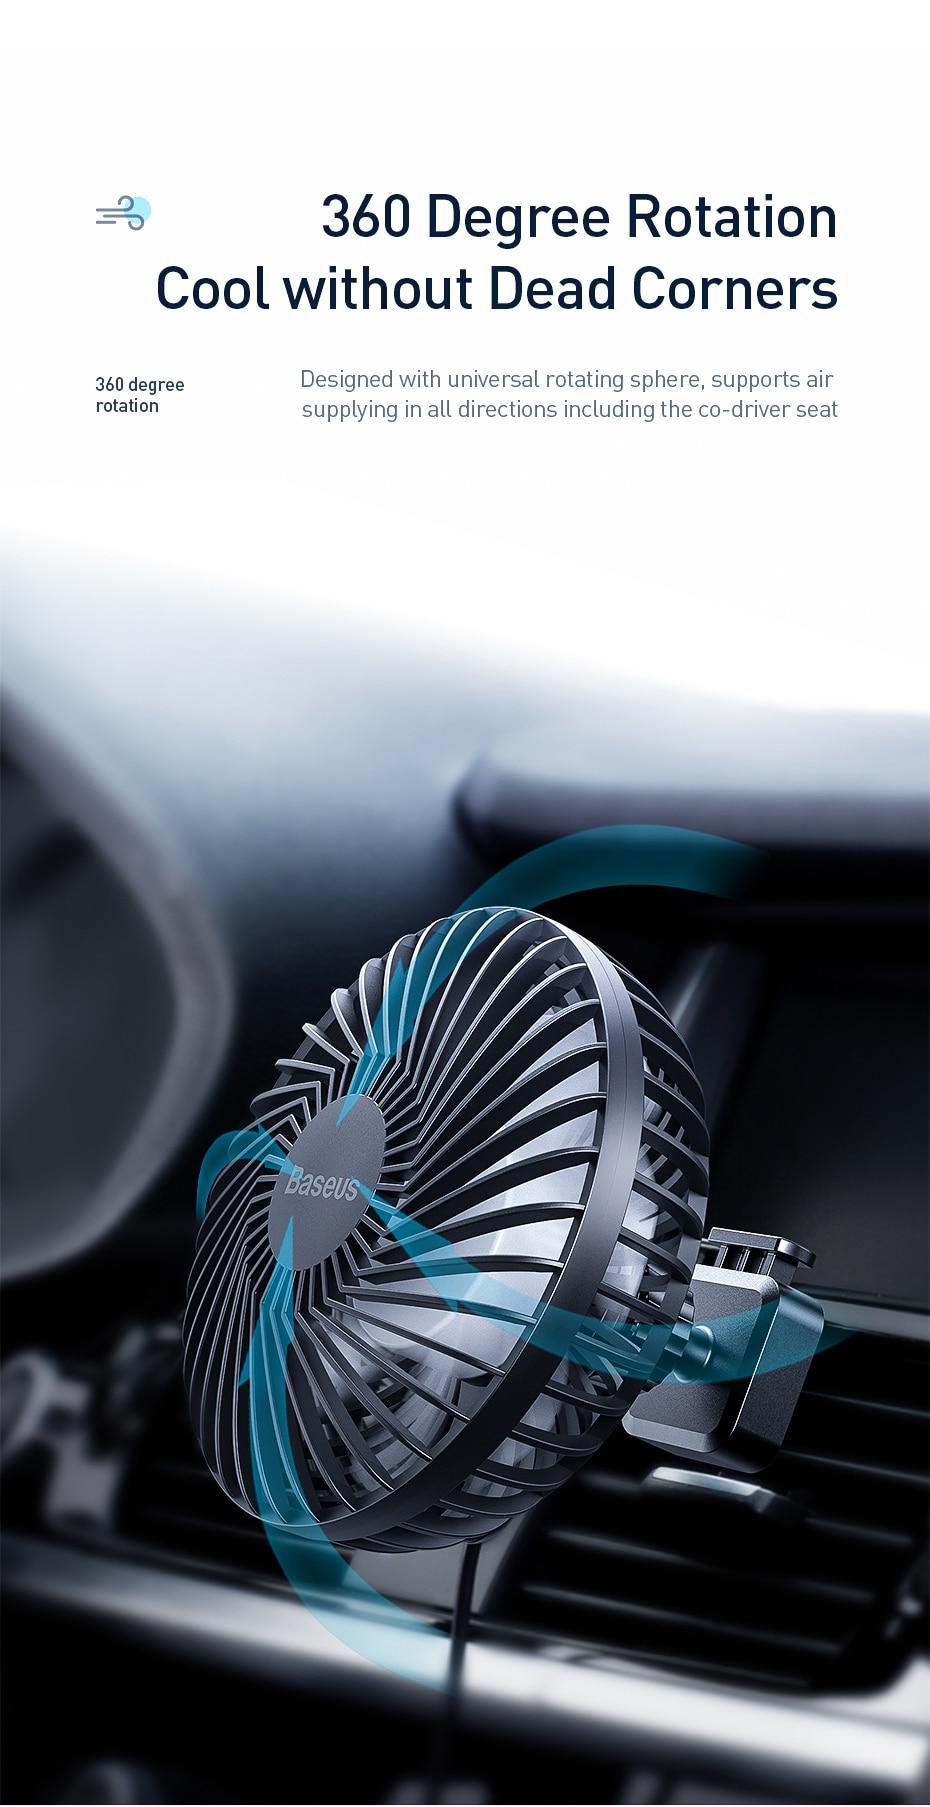 Baseus Air Vent Mounted USB Fan 3 Speed Air Cooling Fan For Car Air 3